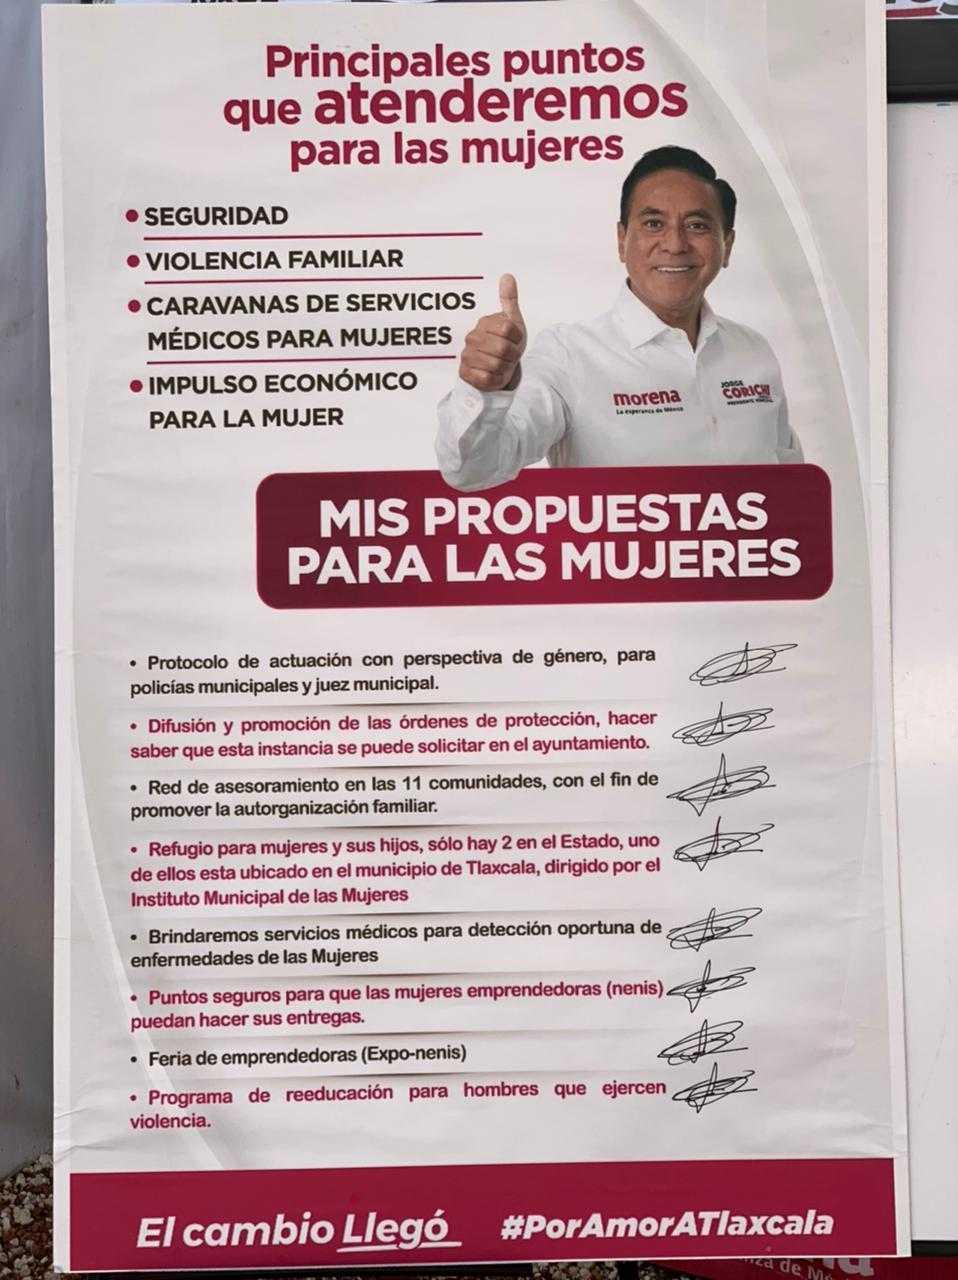 Mensaje de Jorge Corichi en rueda de prensa